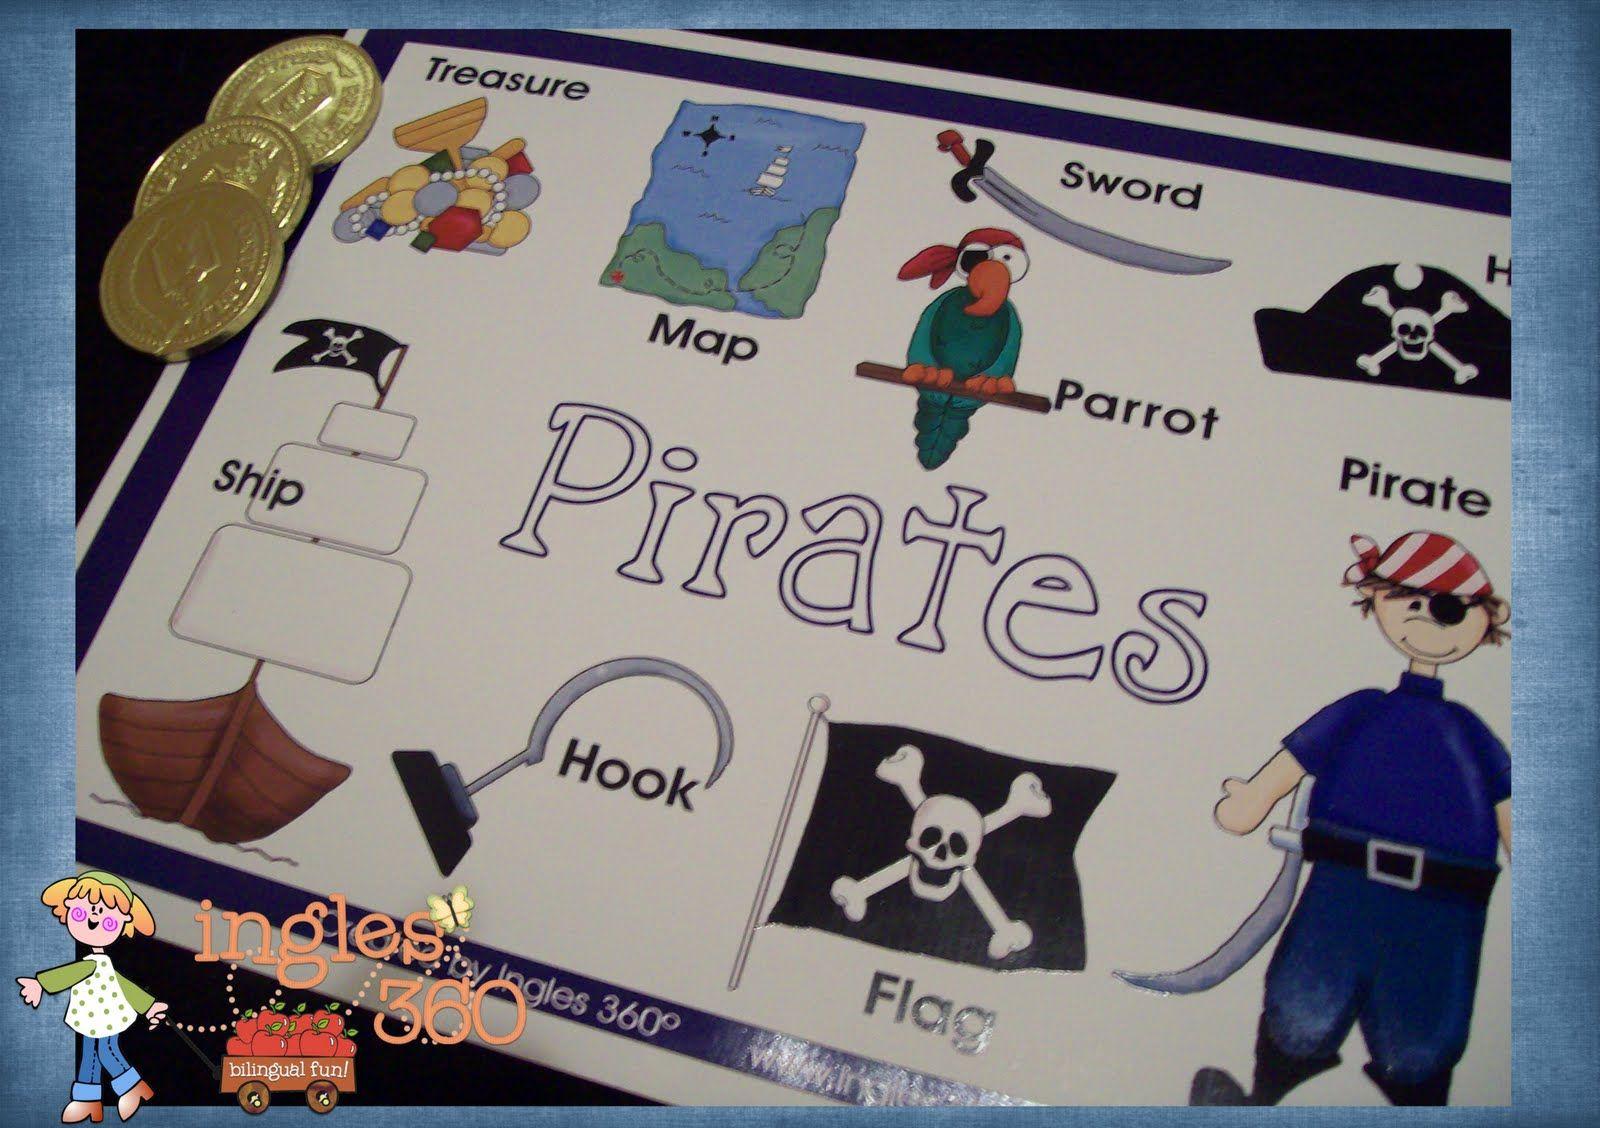 Ingles360 Preschool pirate theme, Pirate activities